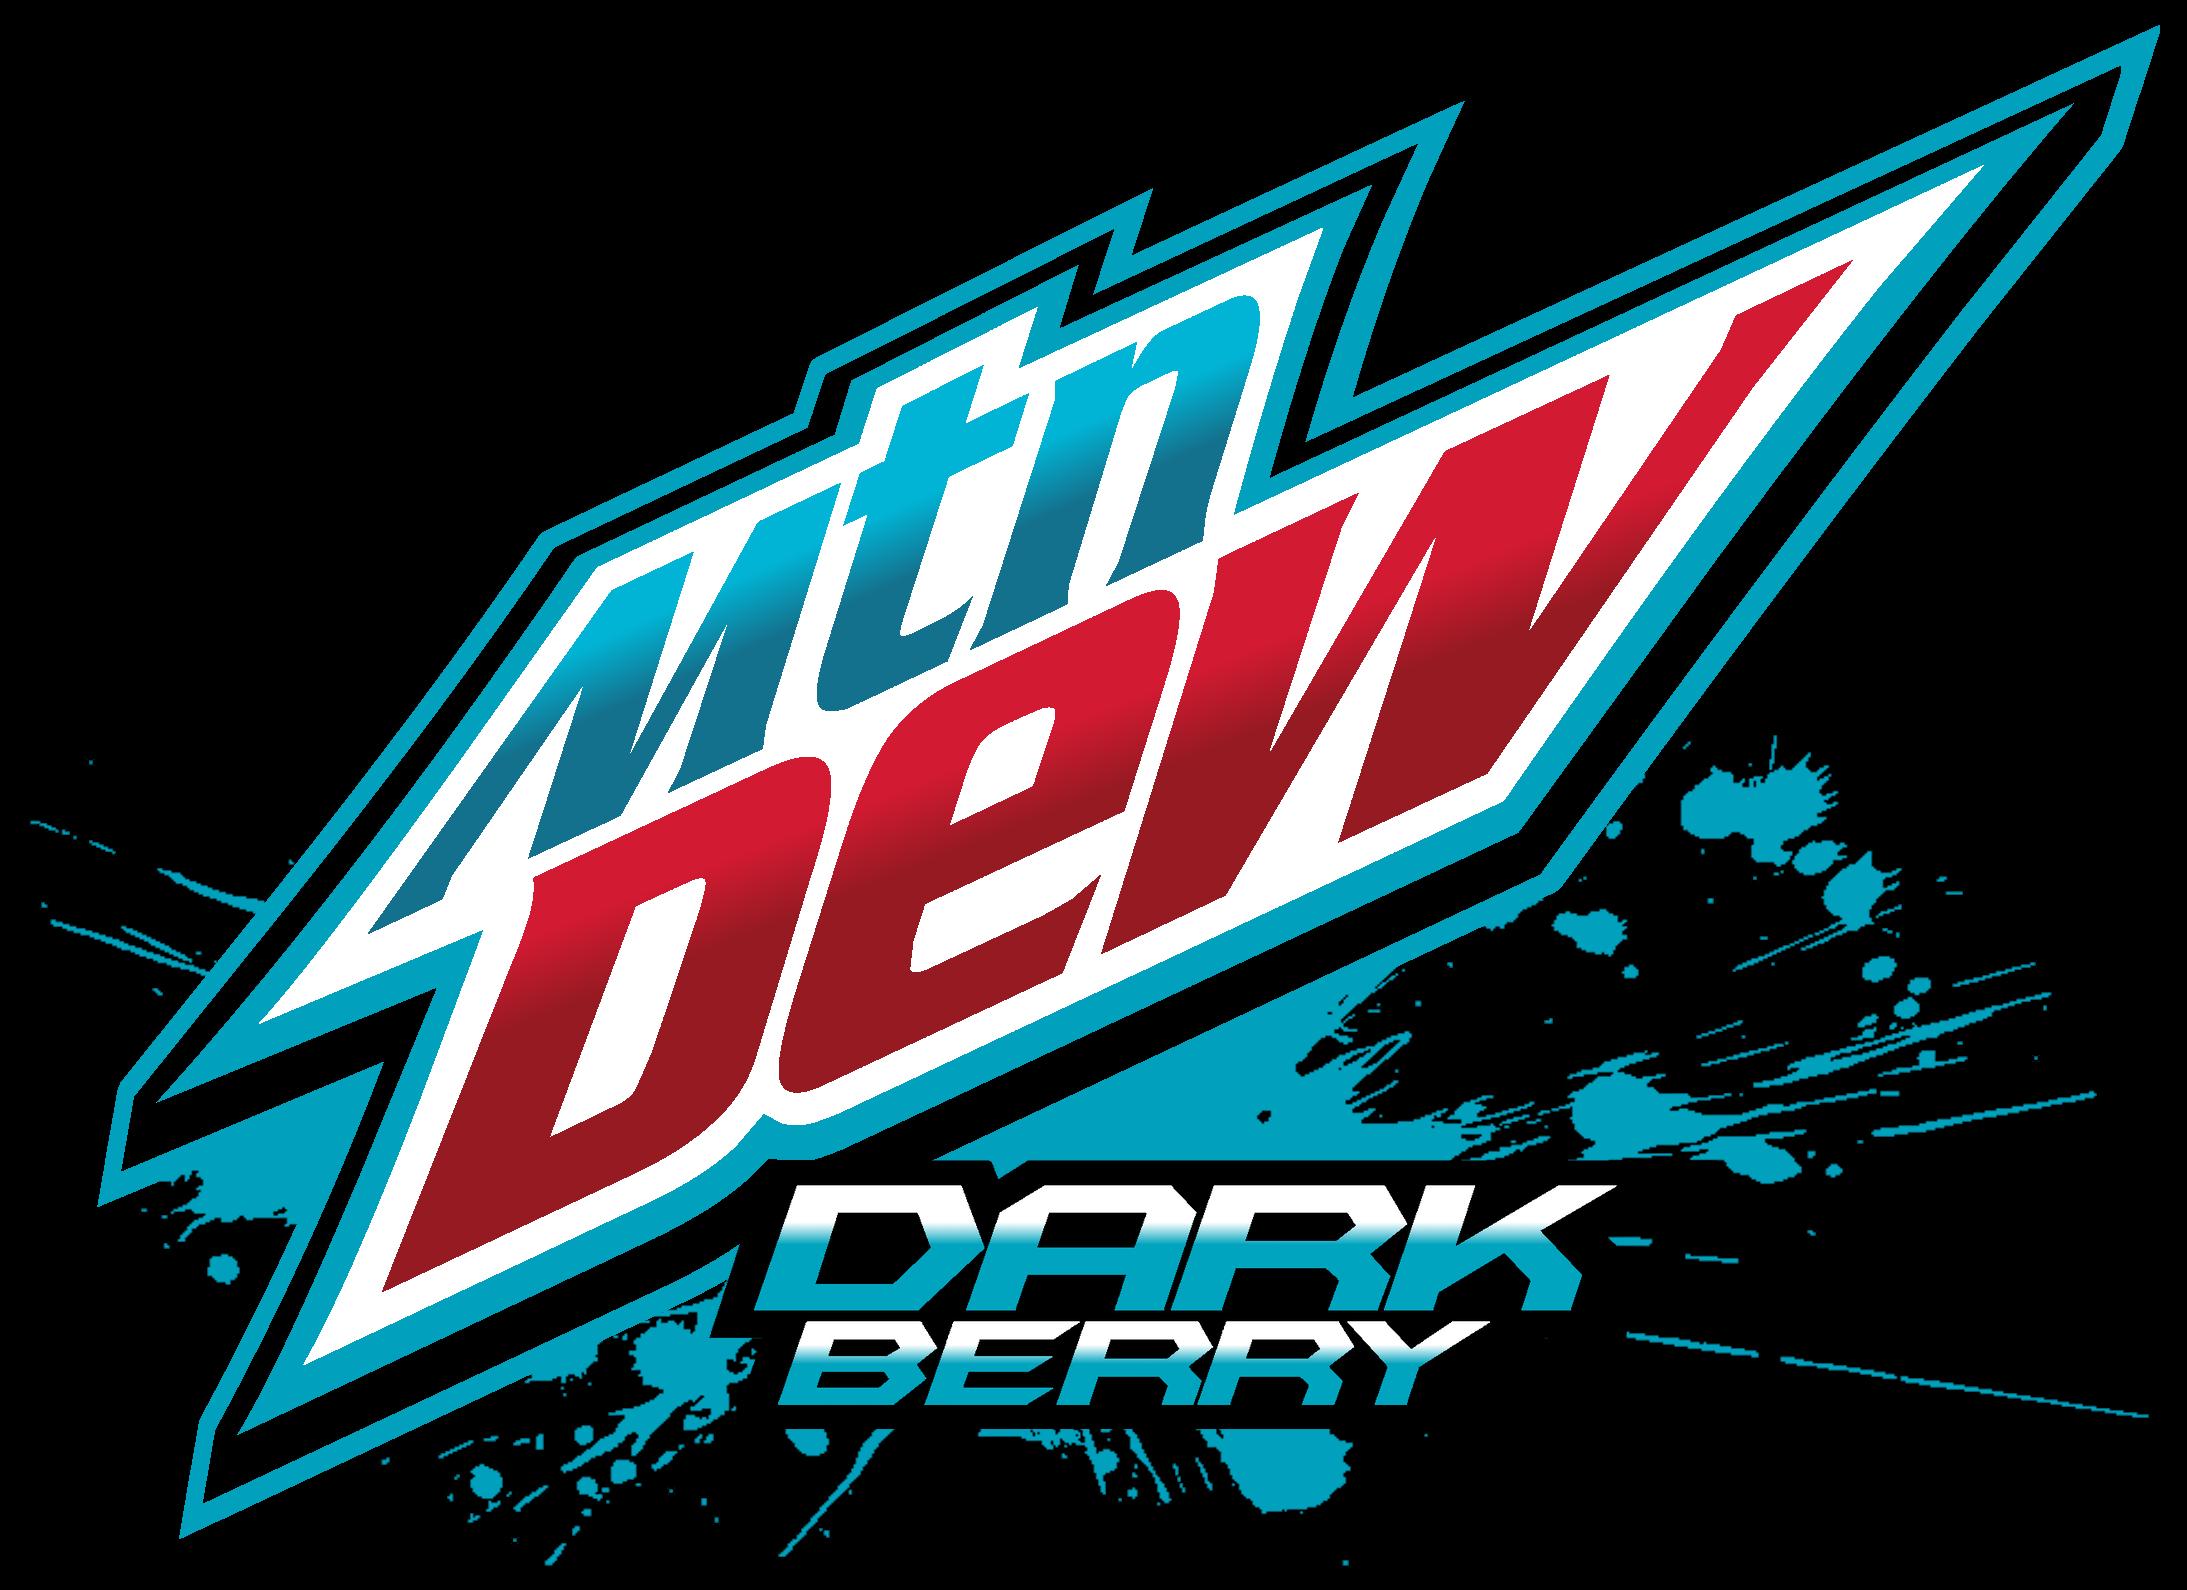 LOGO 2012 DARK BERRY.png